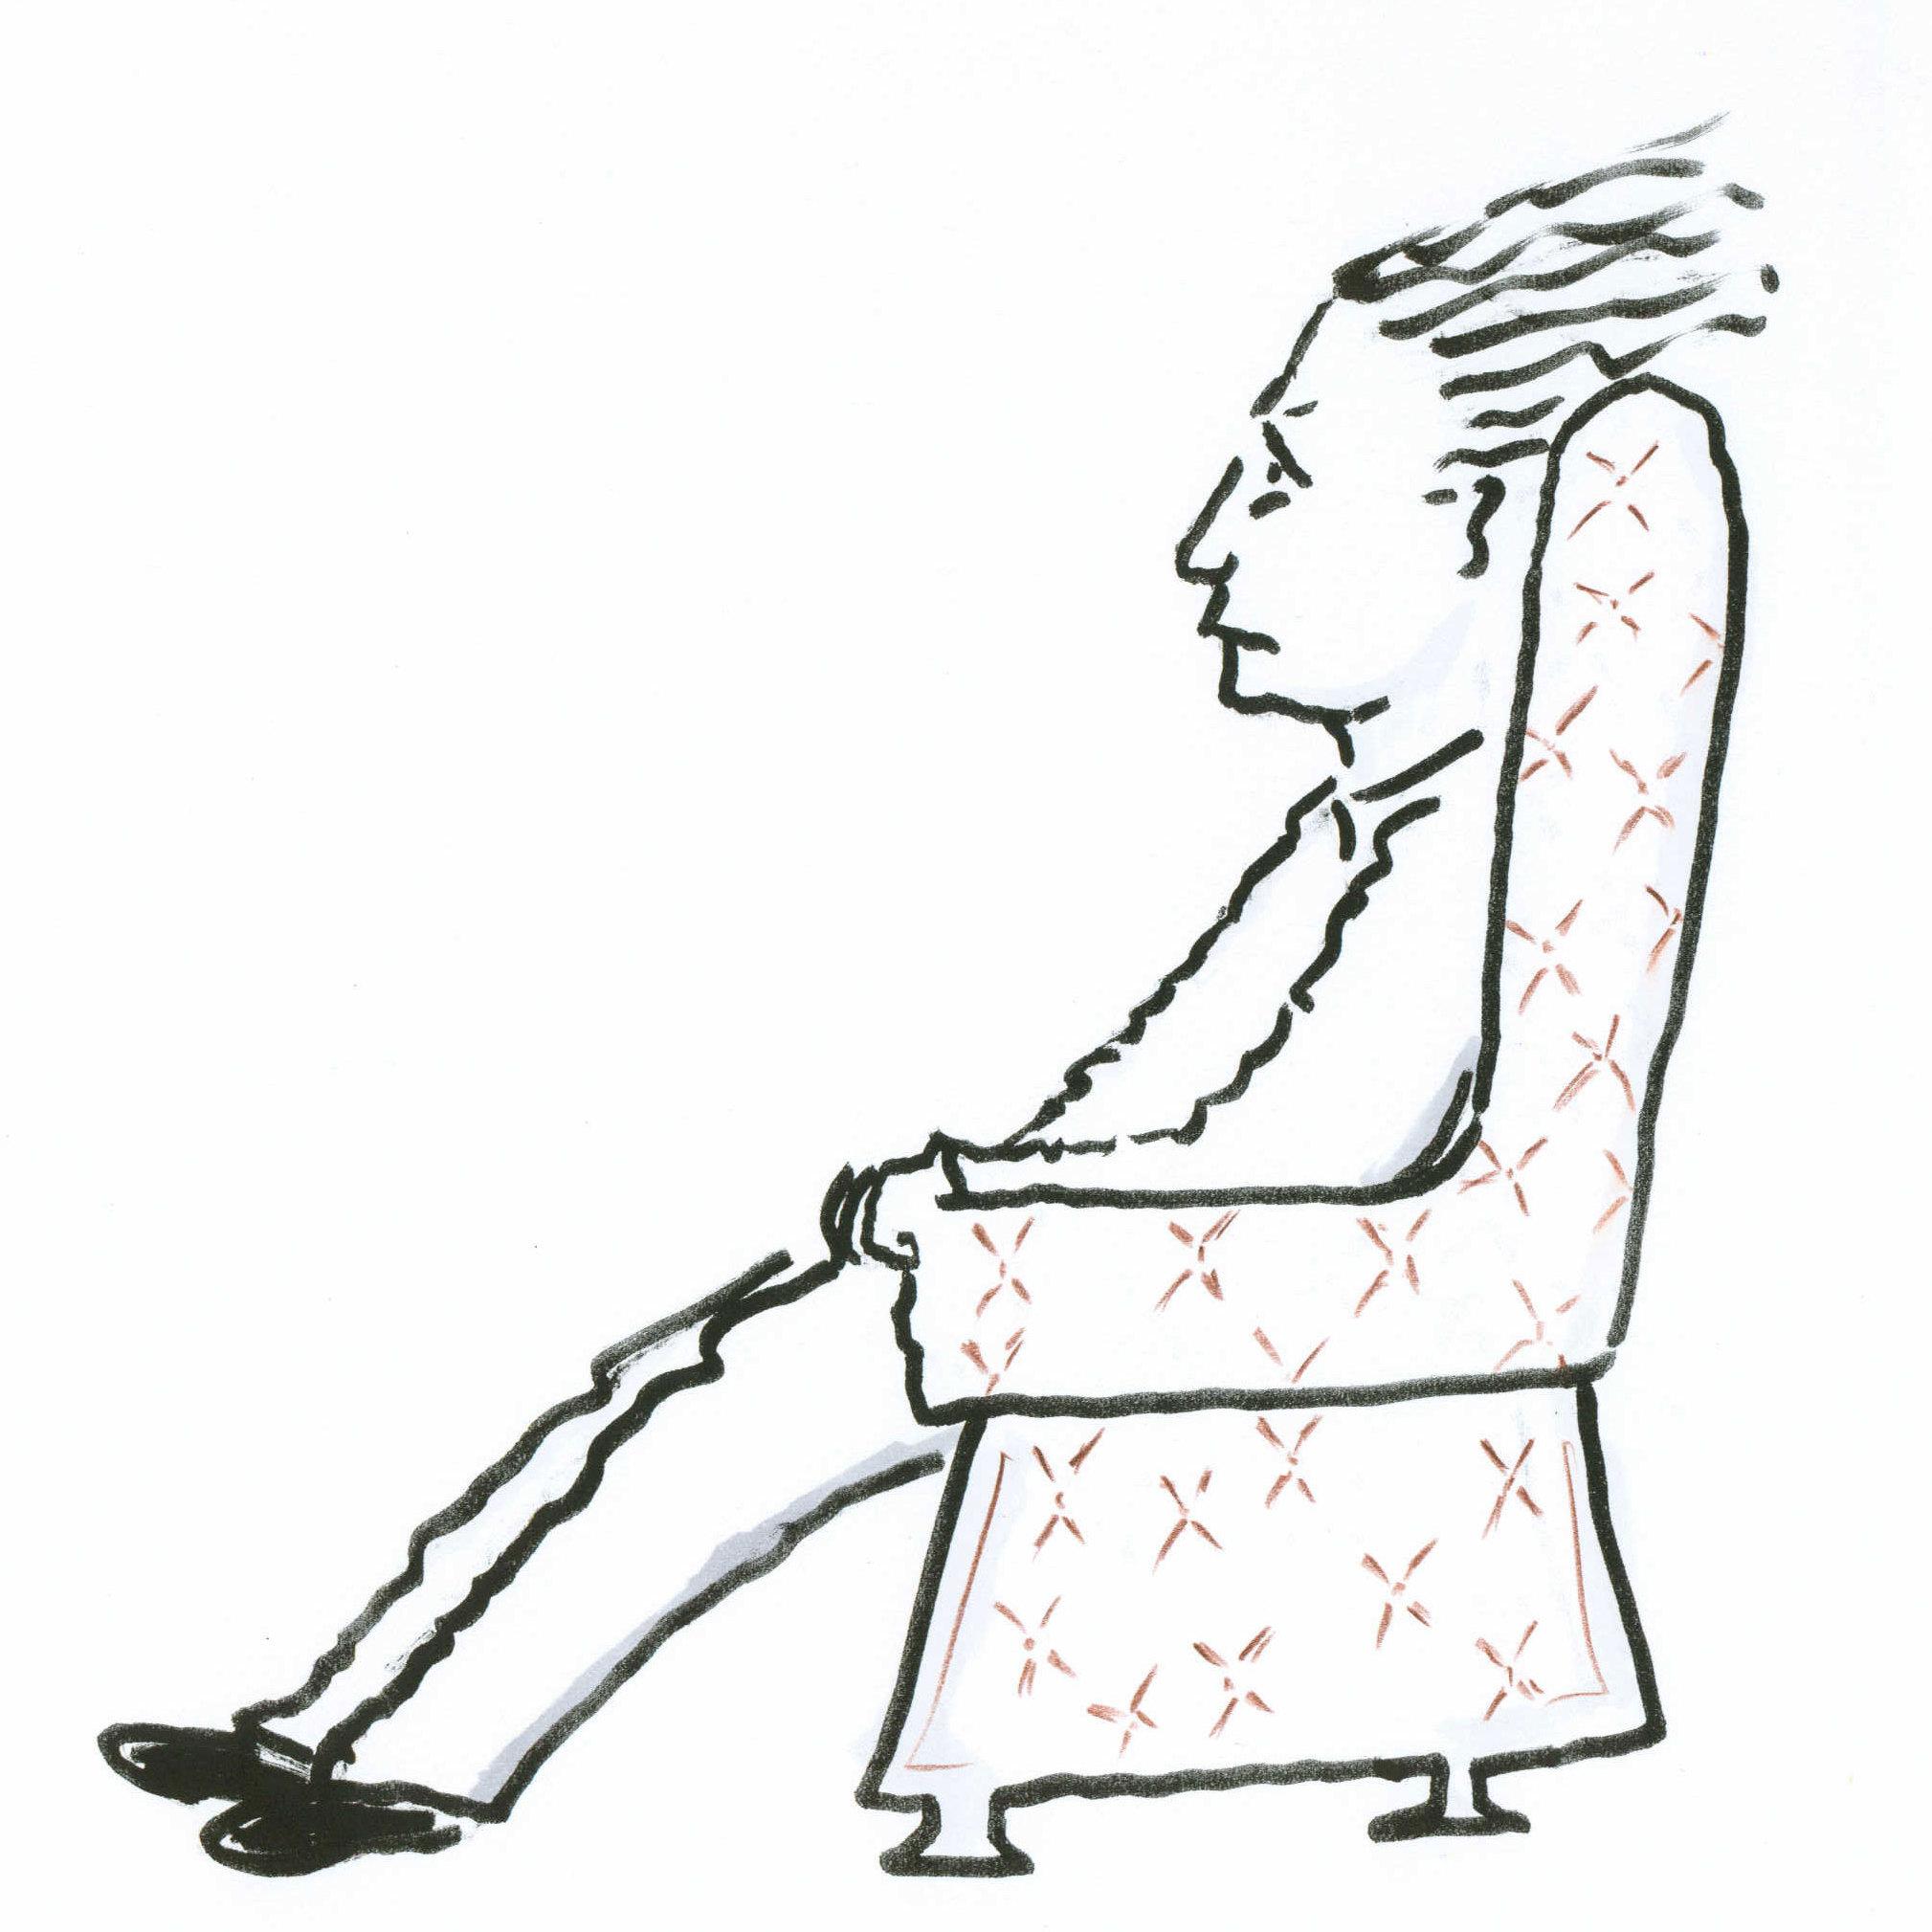 Man in Chair, setting #2.